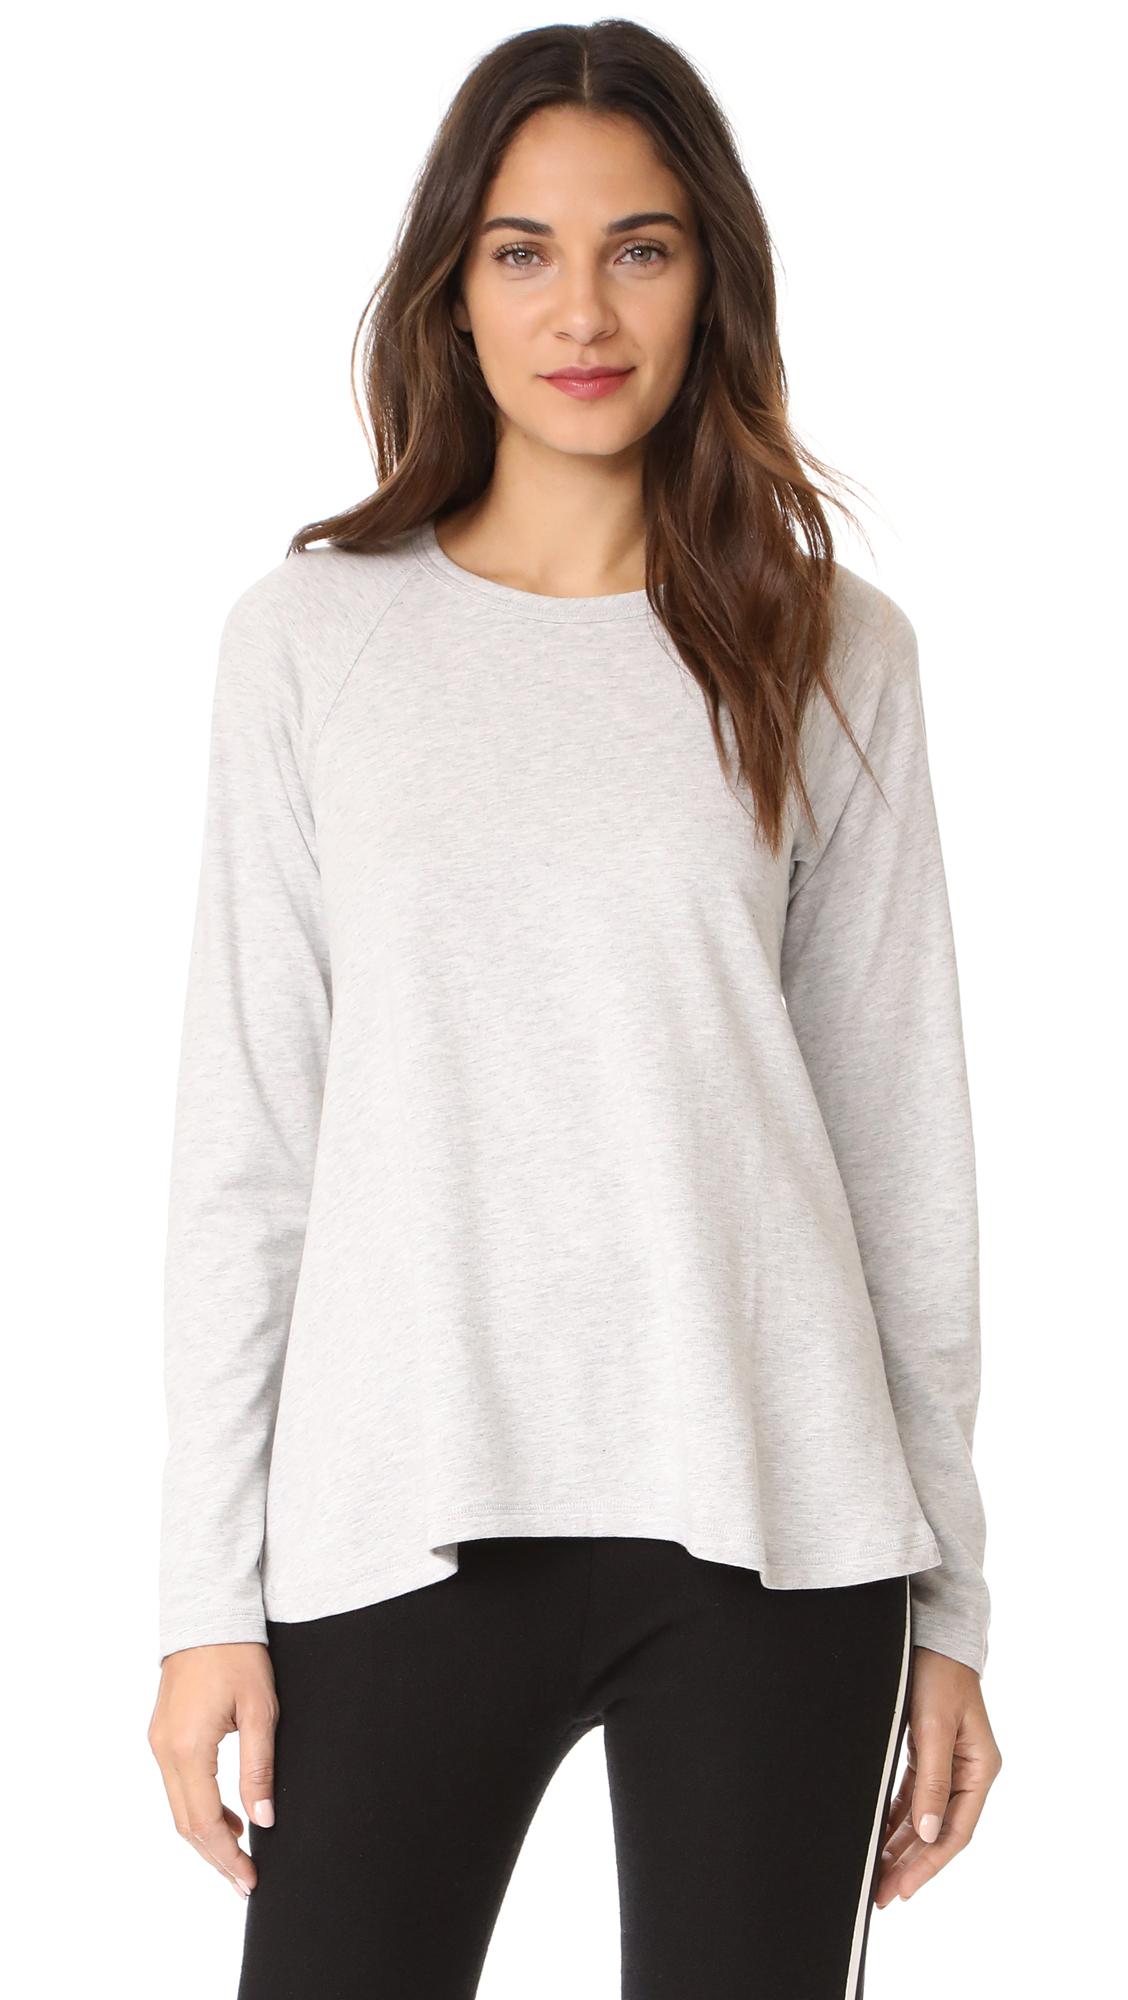 Theory Swing Pullover Sweatshirt - Light Heather Grey